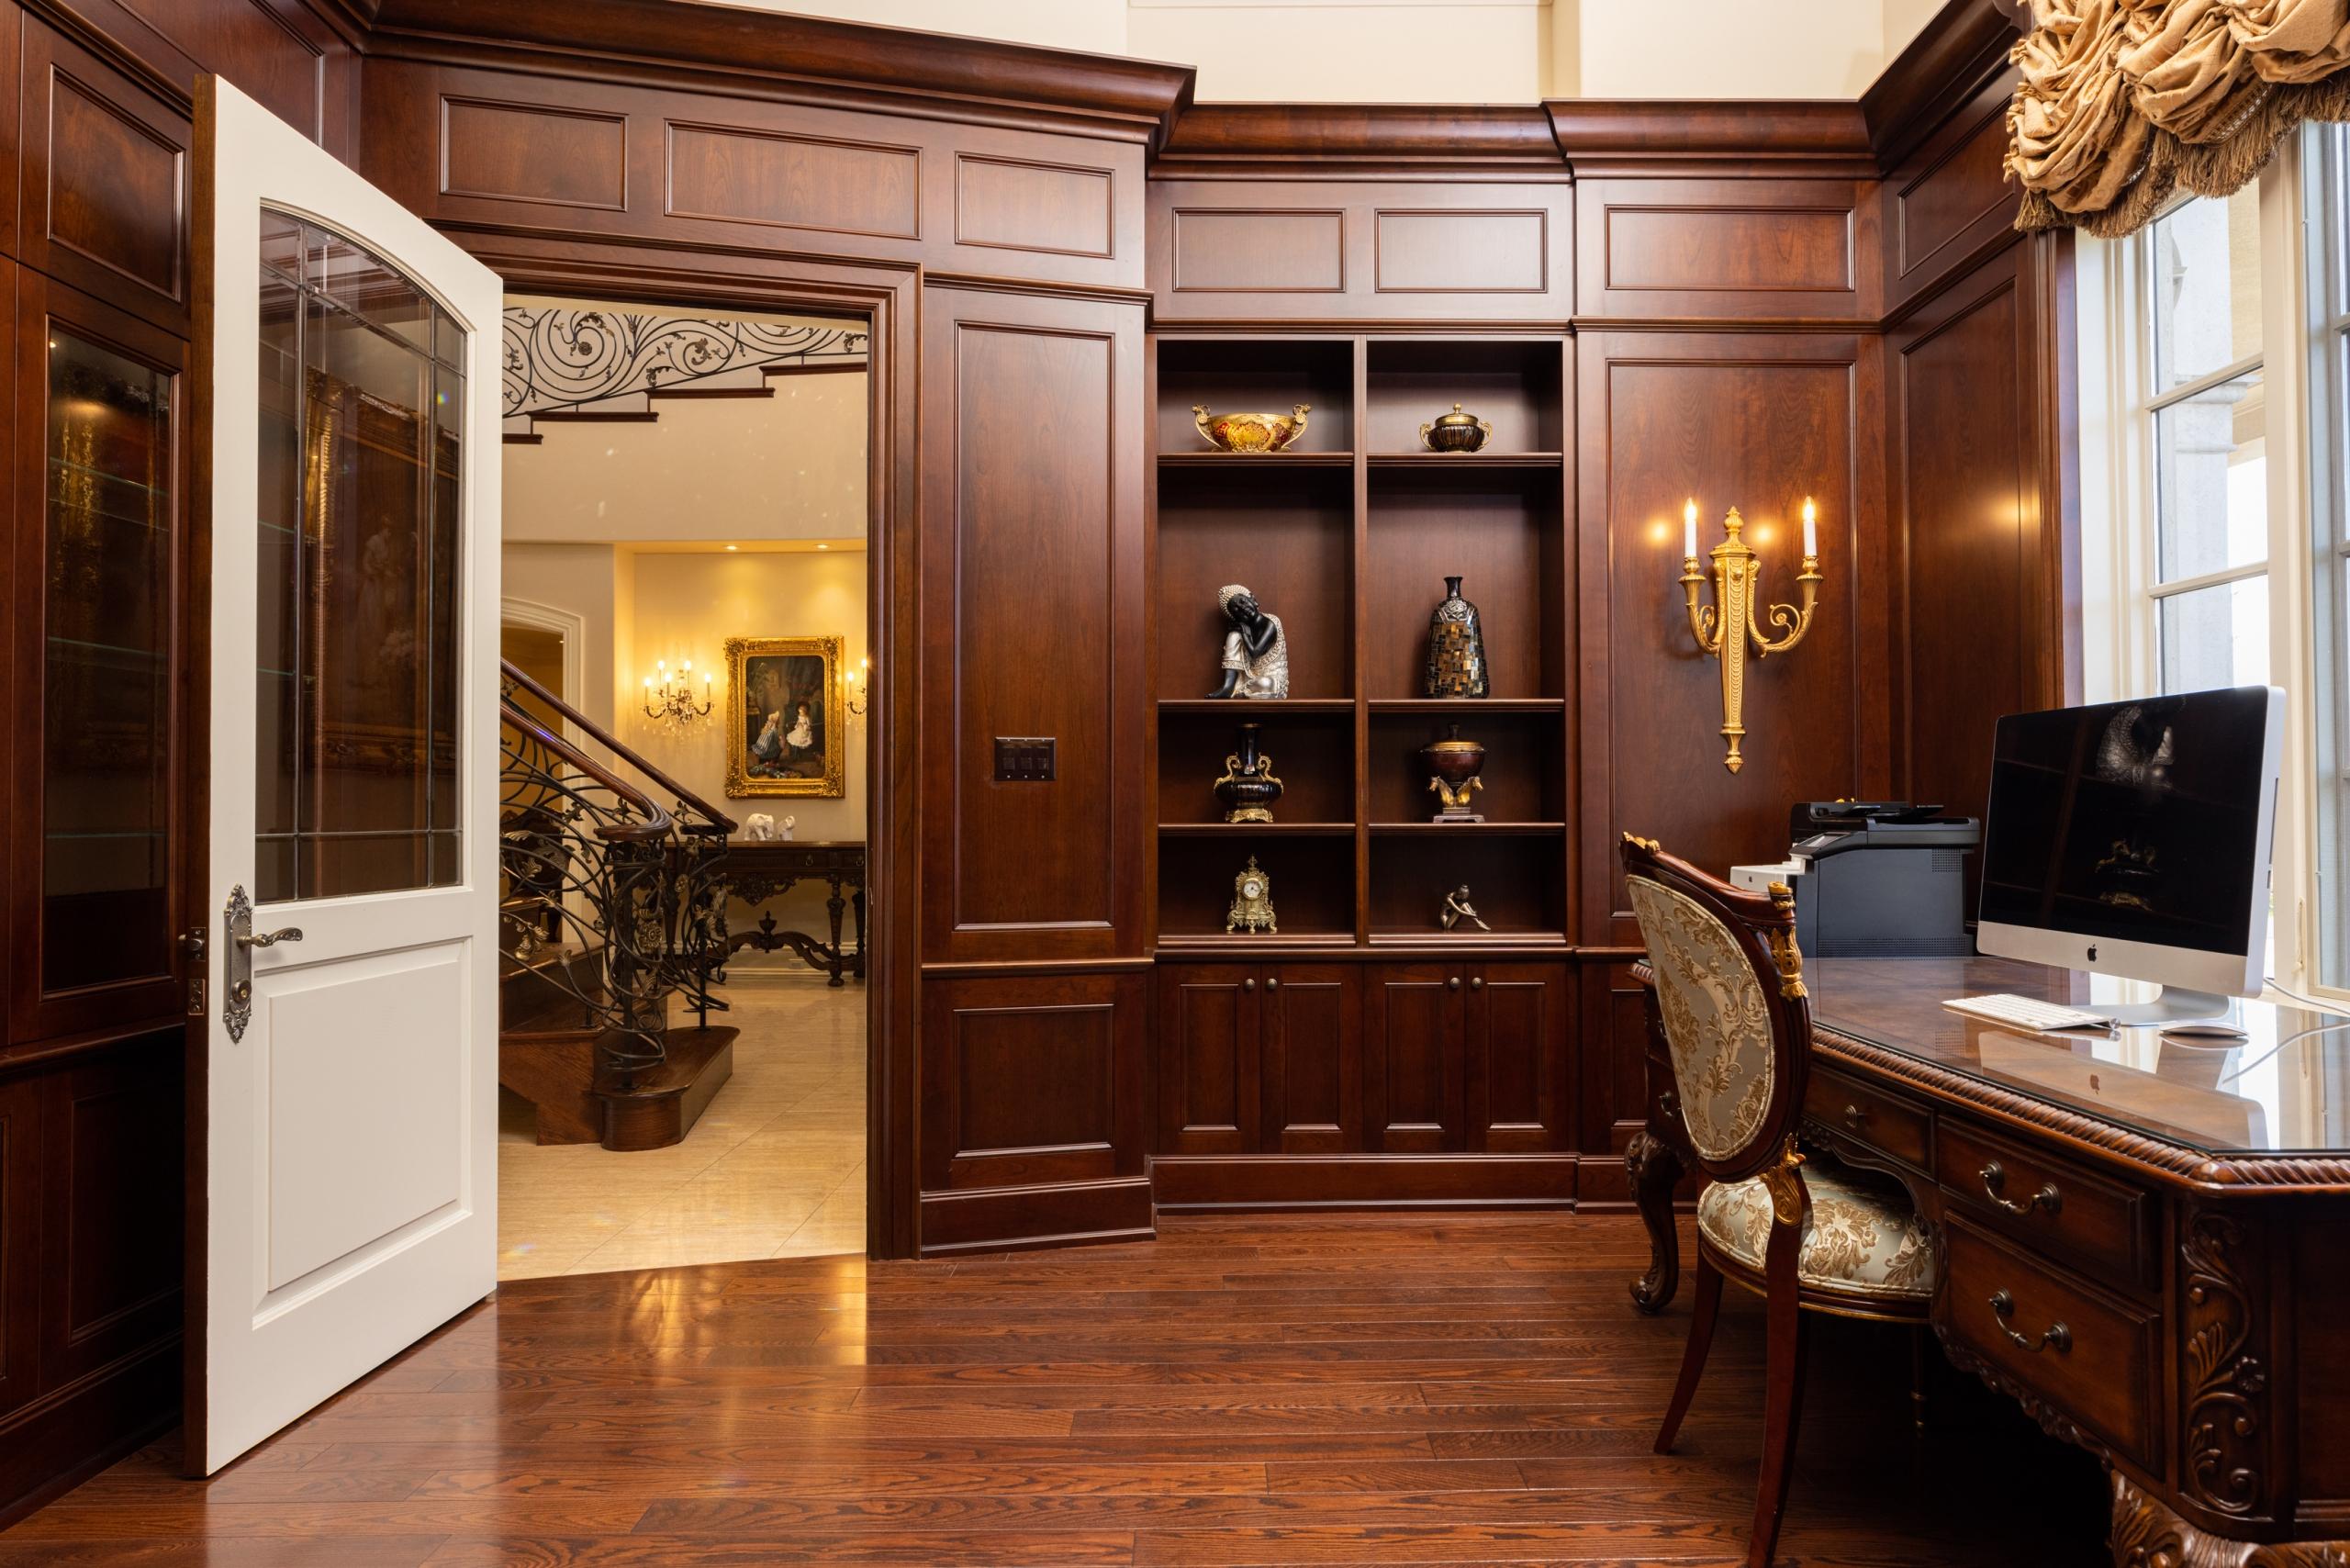 Office room featured at 2594 Bluffs Way, Burlington at Alex Irish & Associates